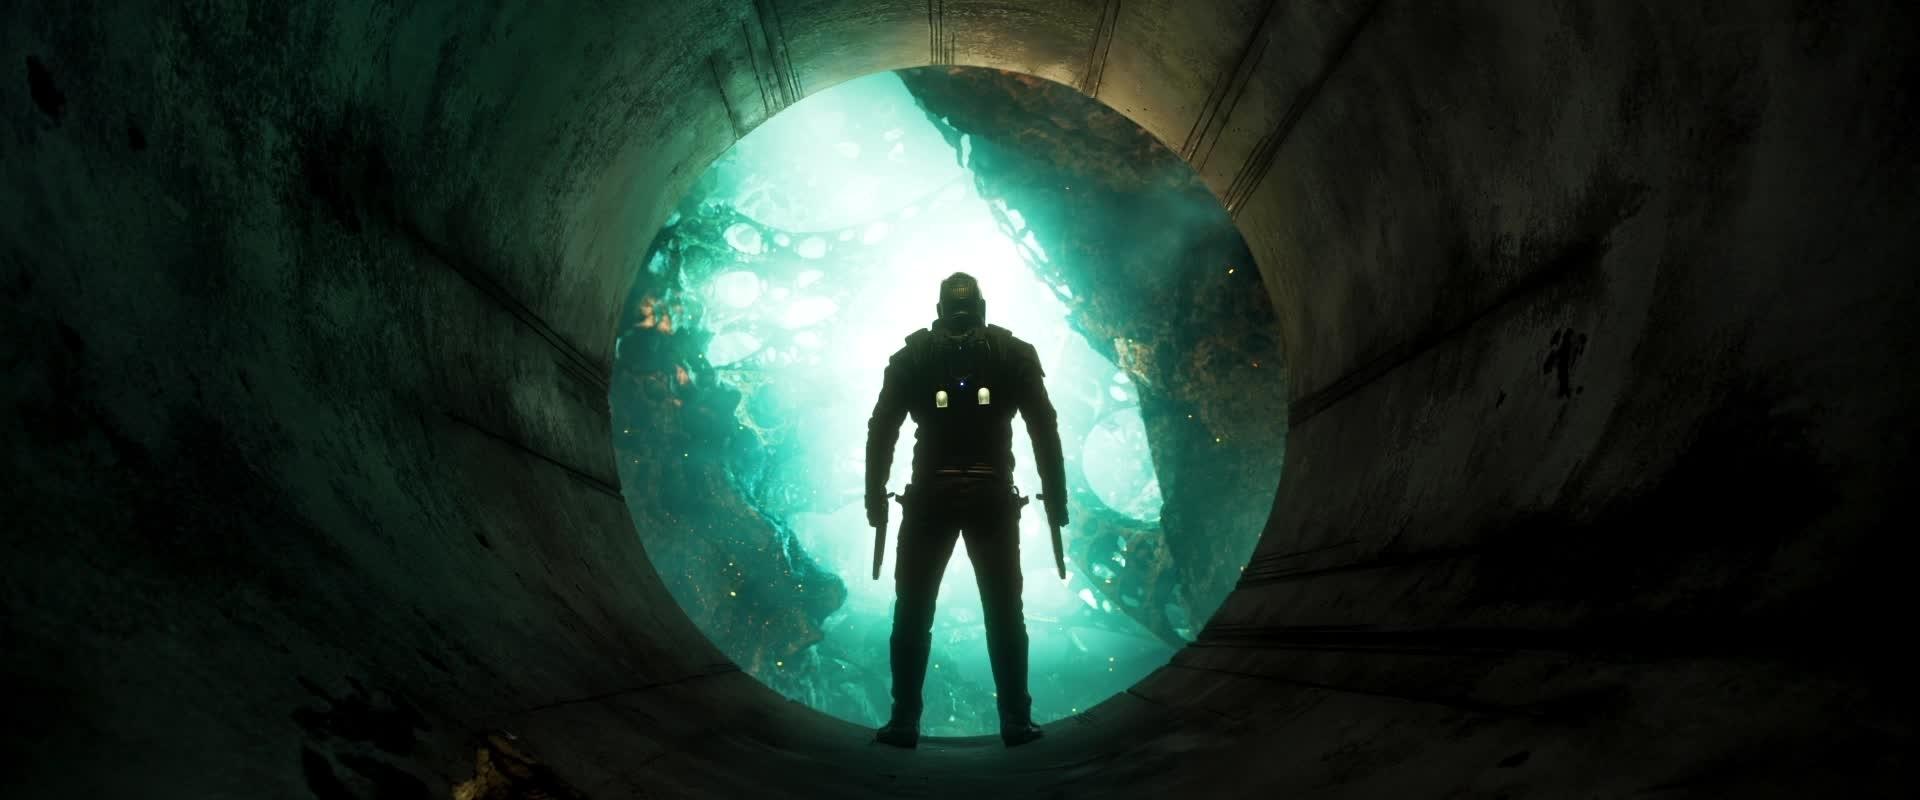 Les Gardiens de la Galaxie Vol.2 - Premier aperçu